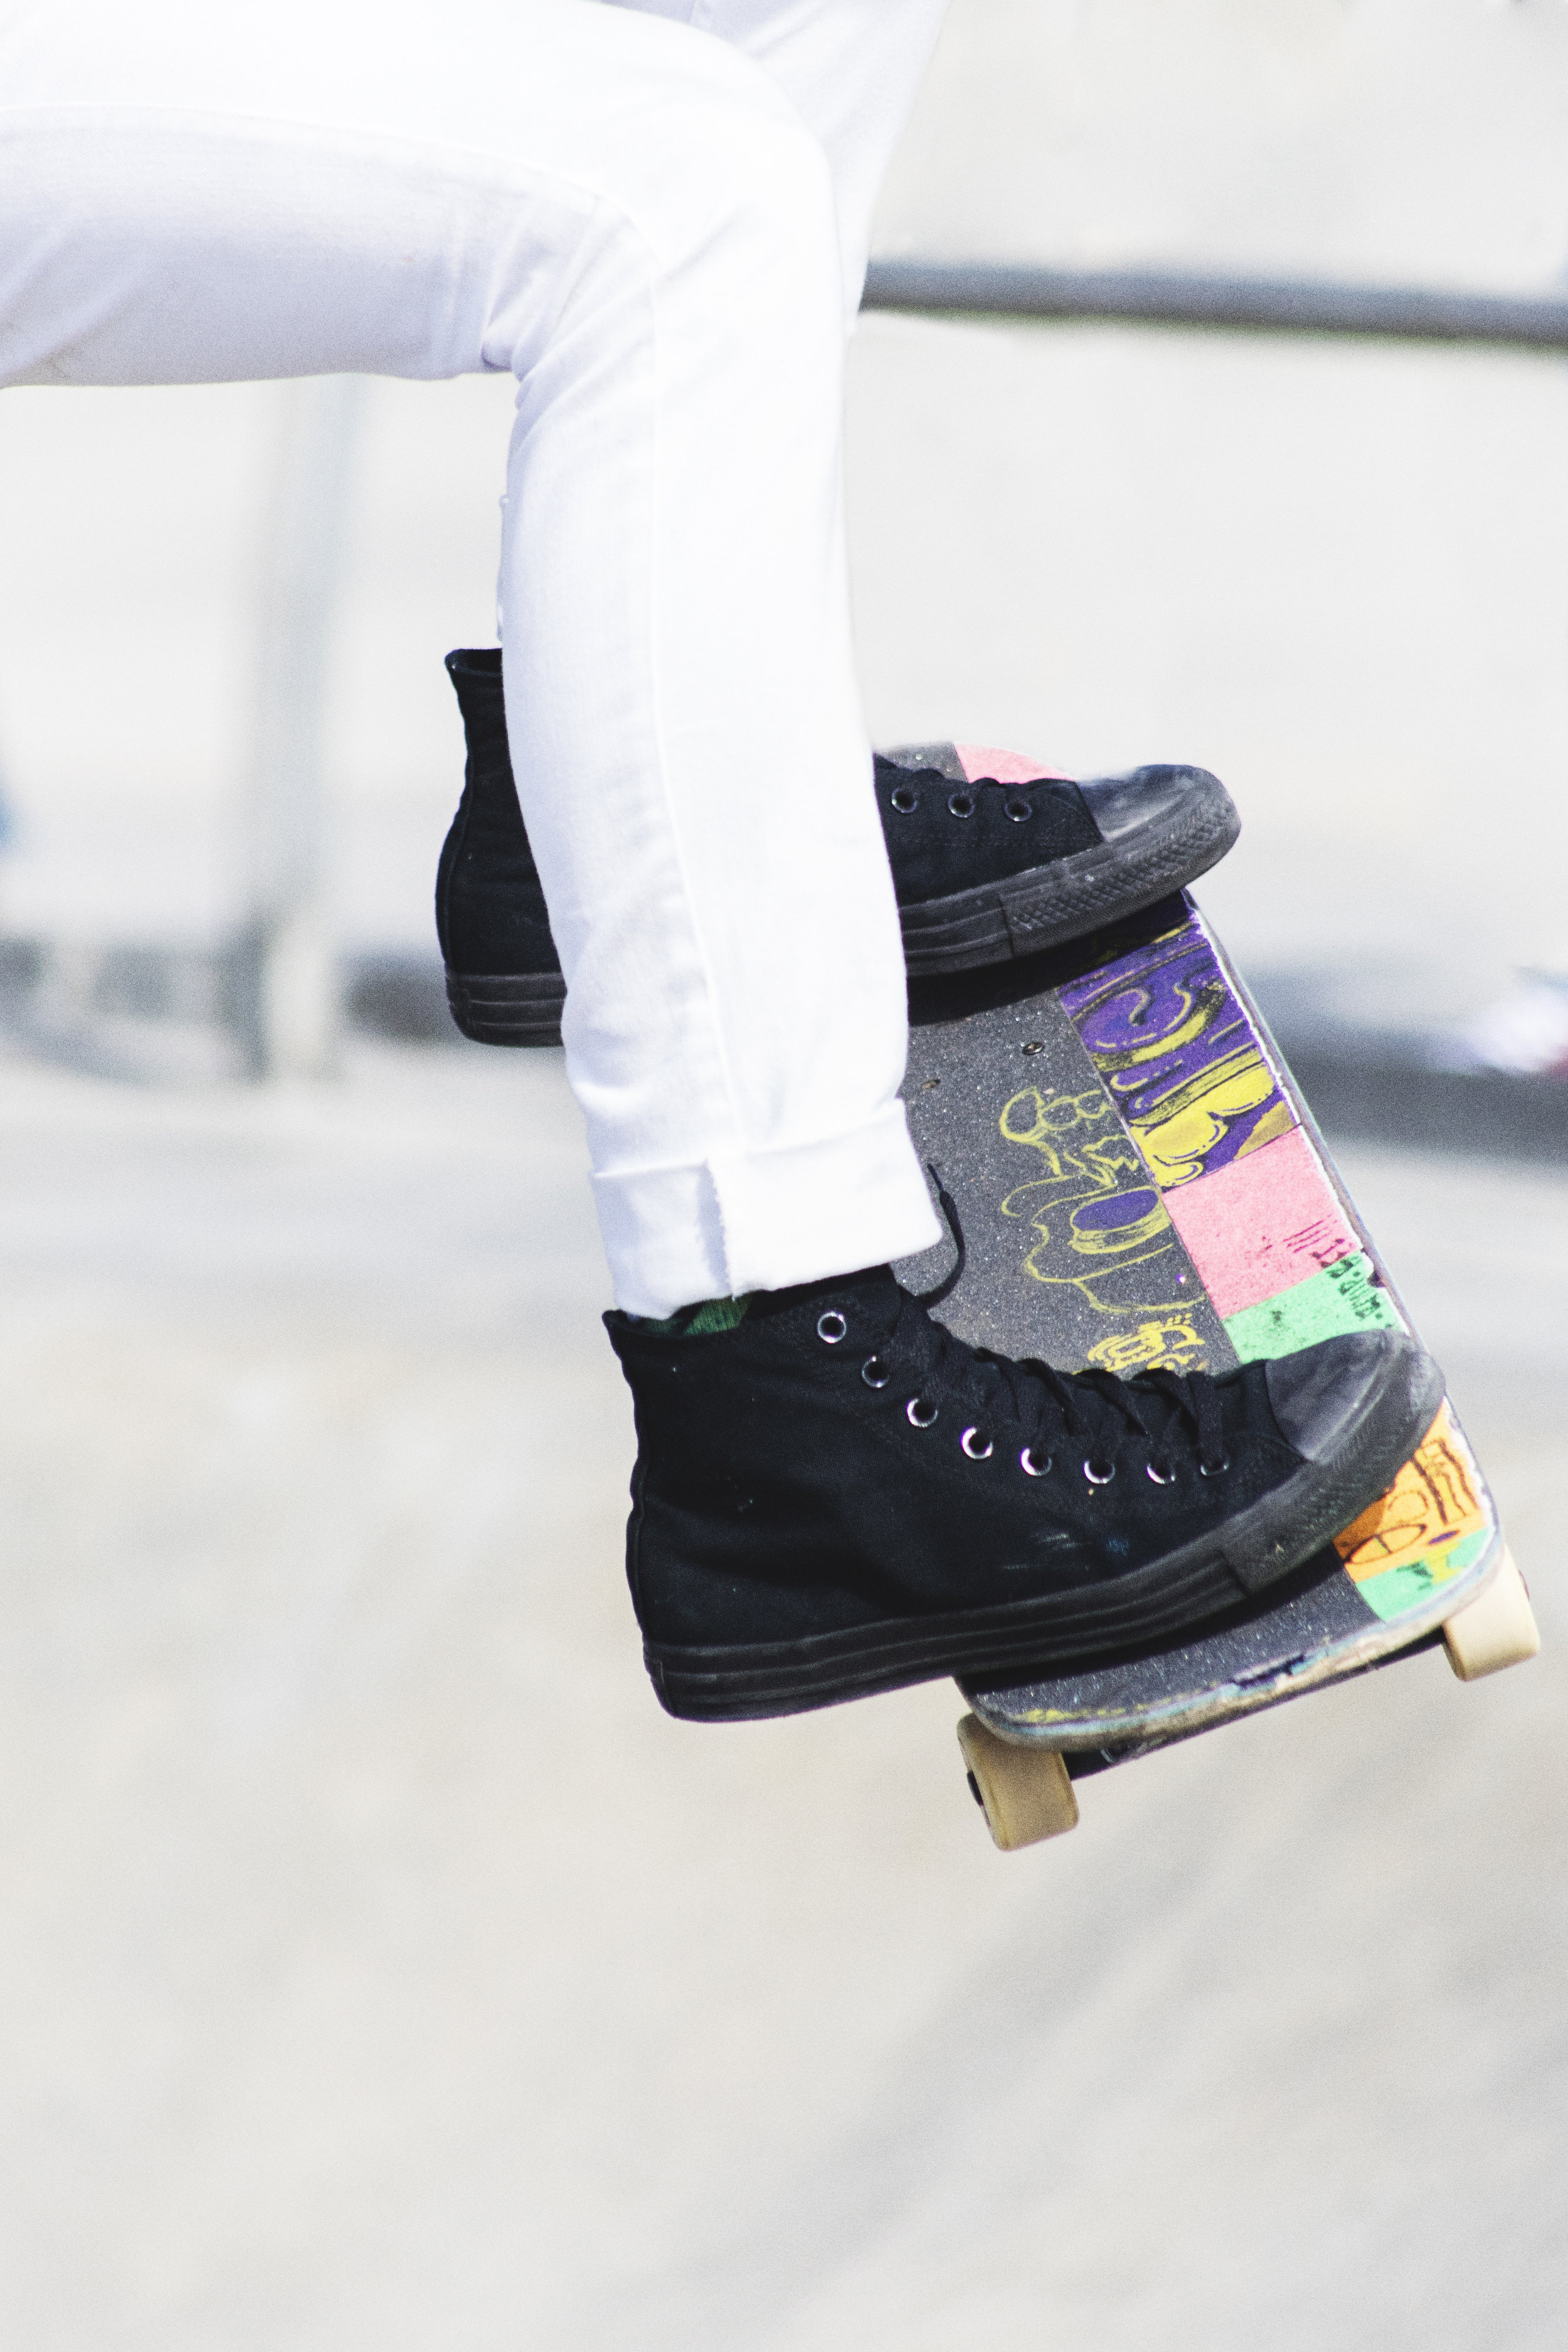 Venice_Skate_826.jpg